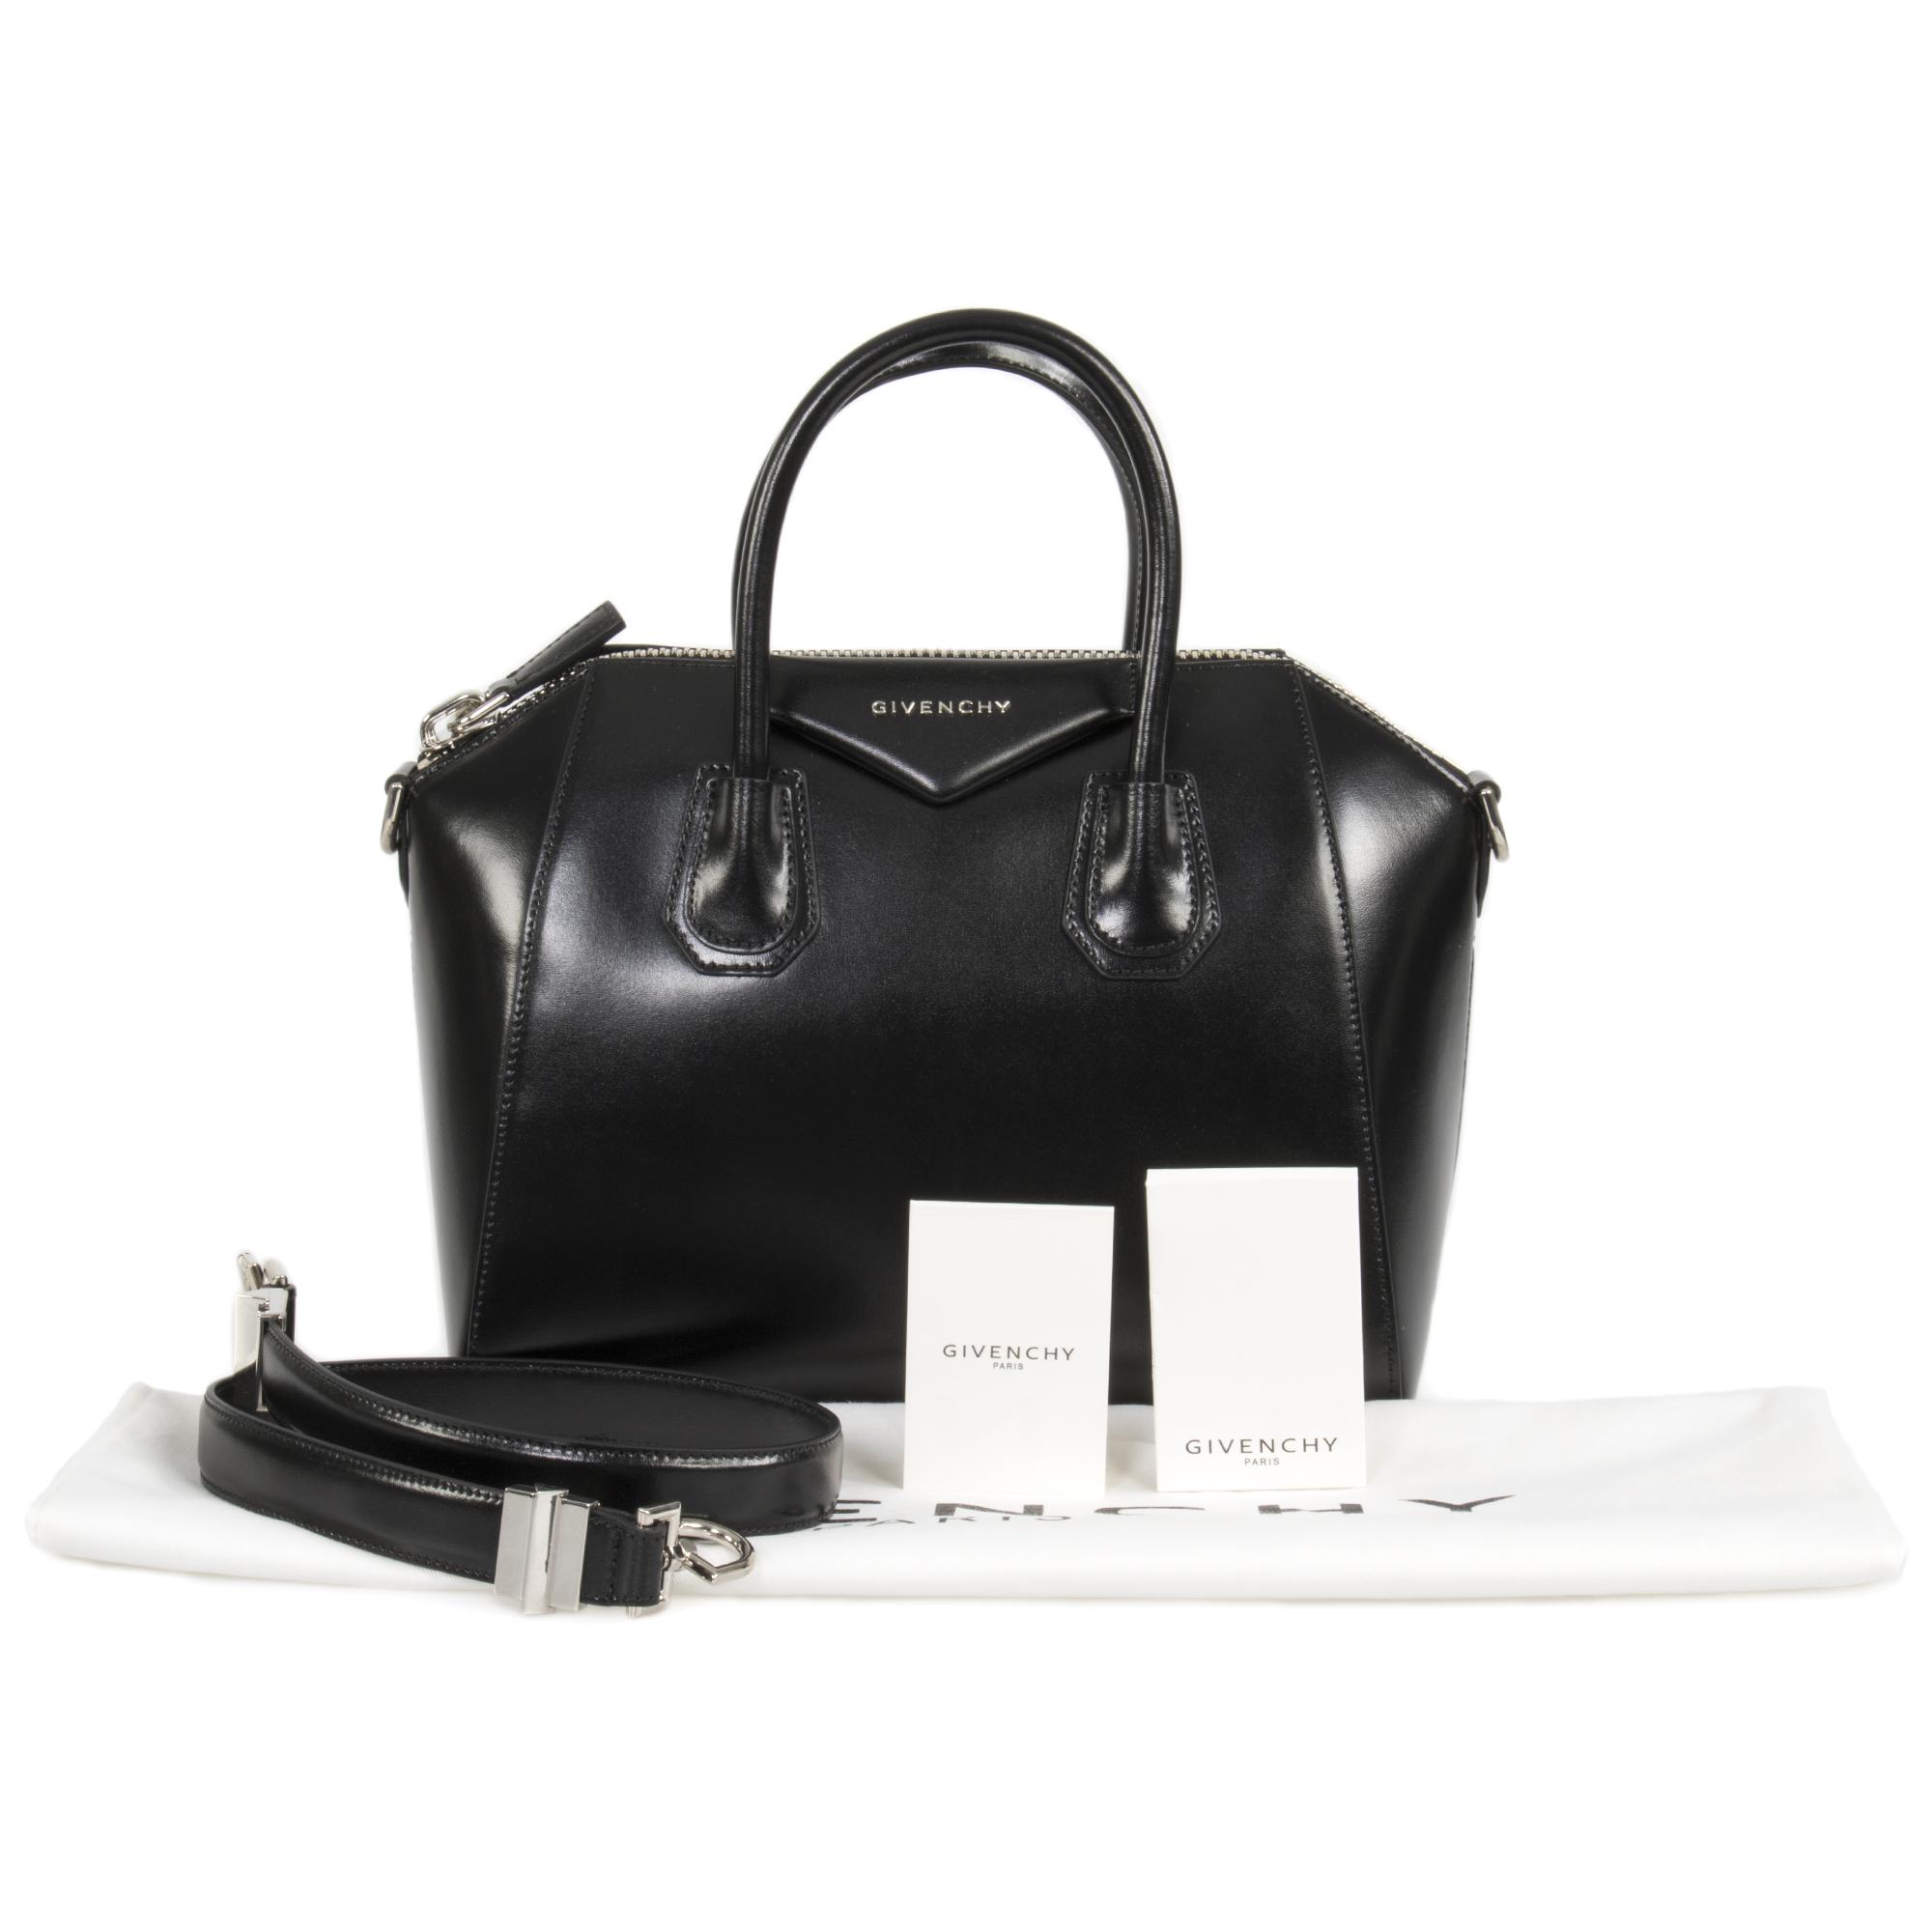 be07091097804 Givenchy - Givenchy Antigona Calfskin Leather Satchel Bag